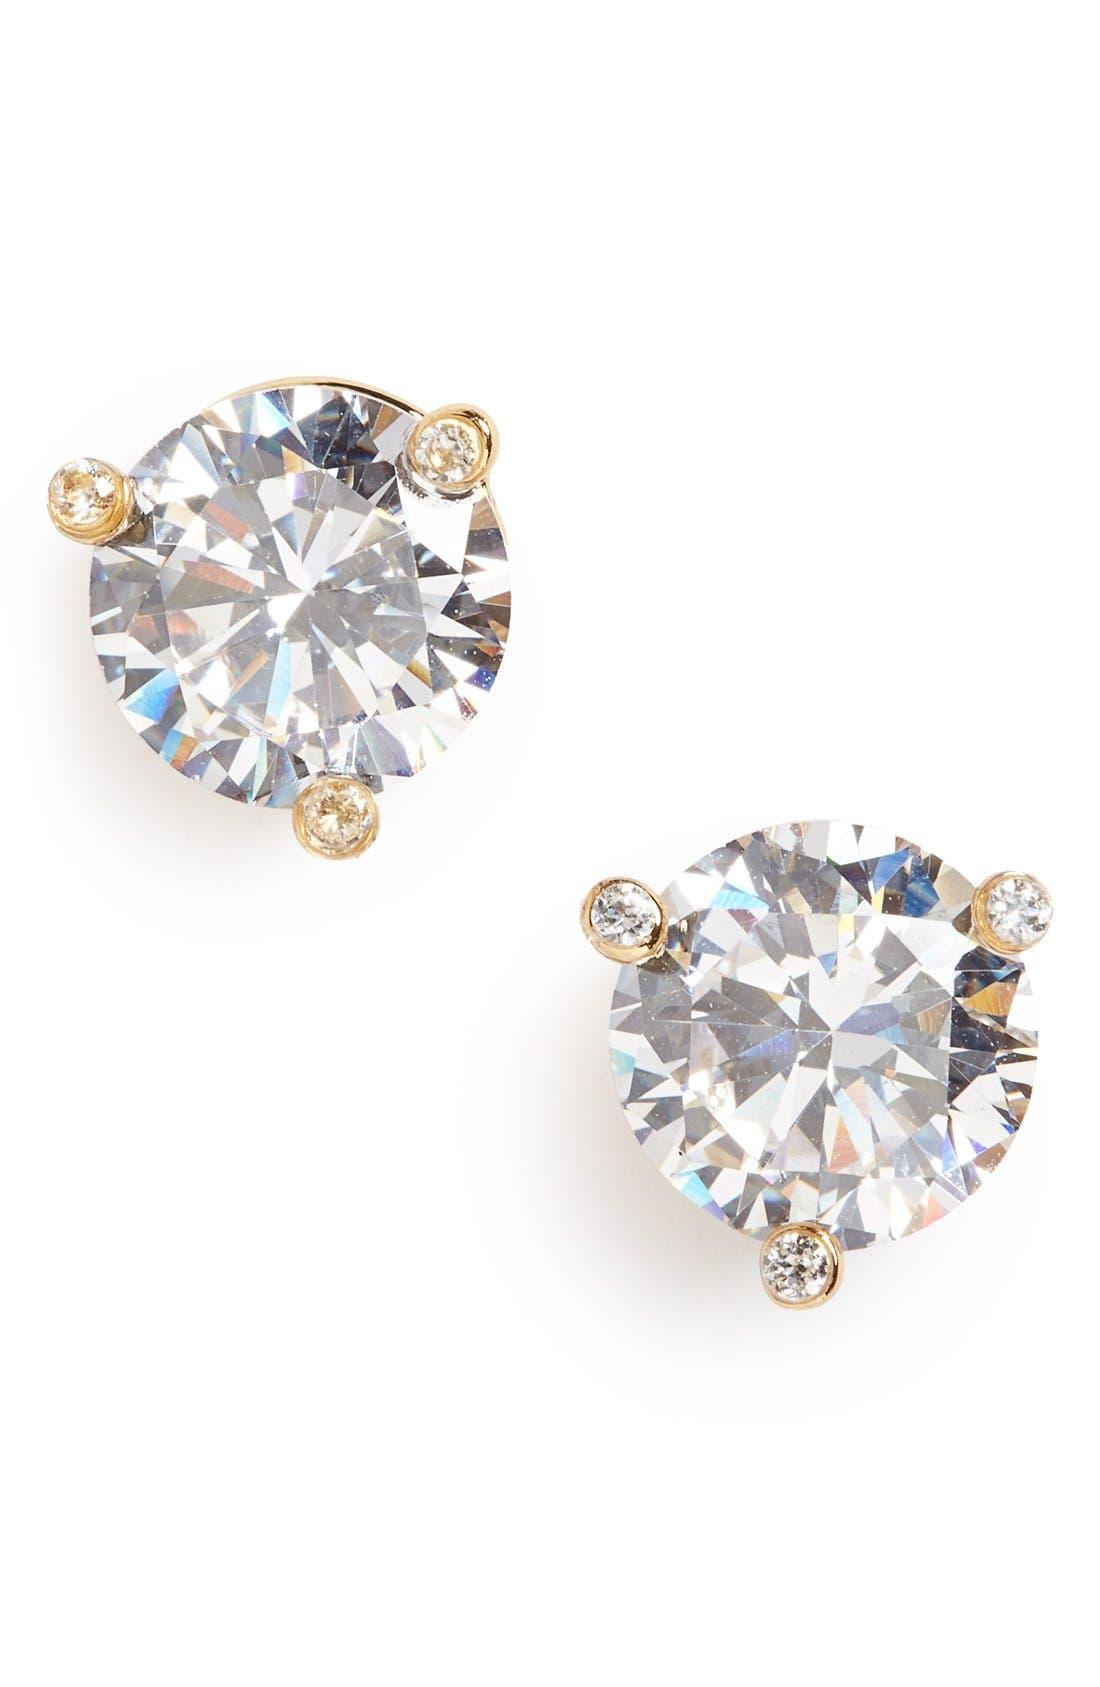 KATE SPADE NEW YORK rise and shine stud earrings